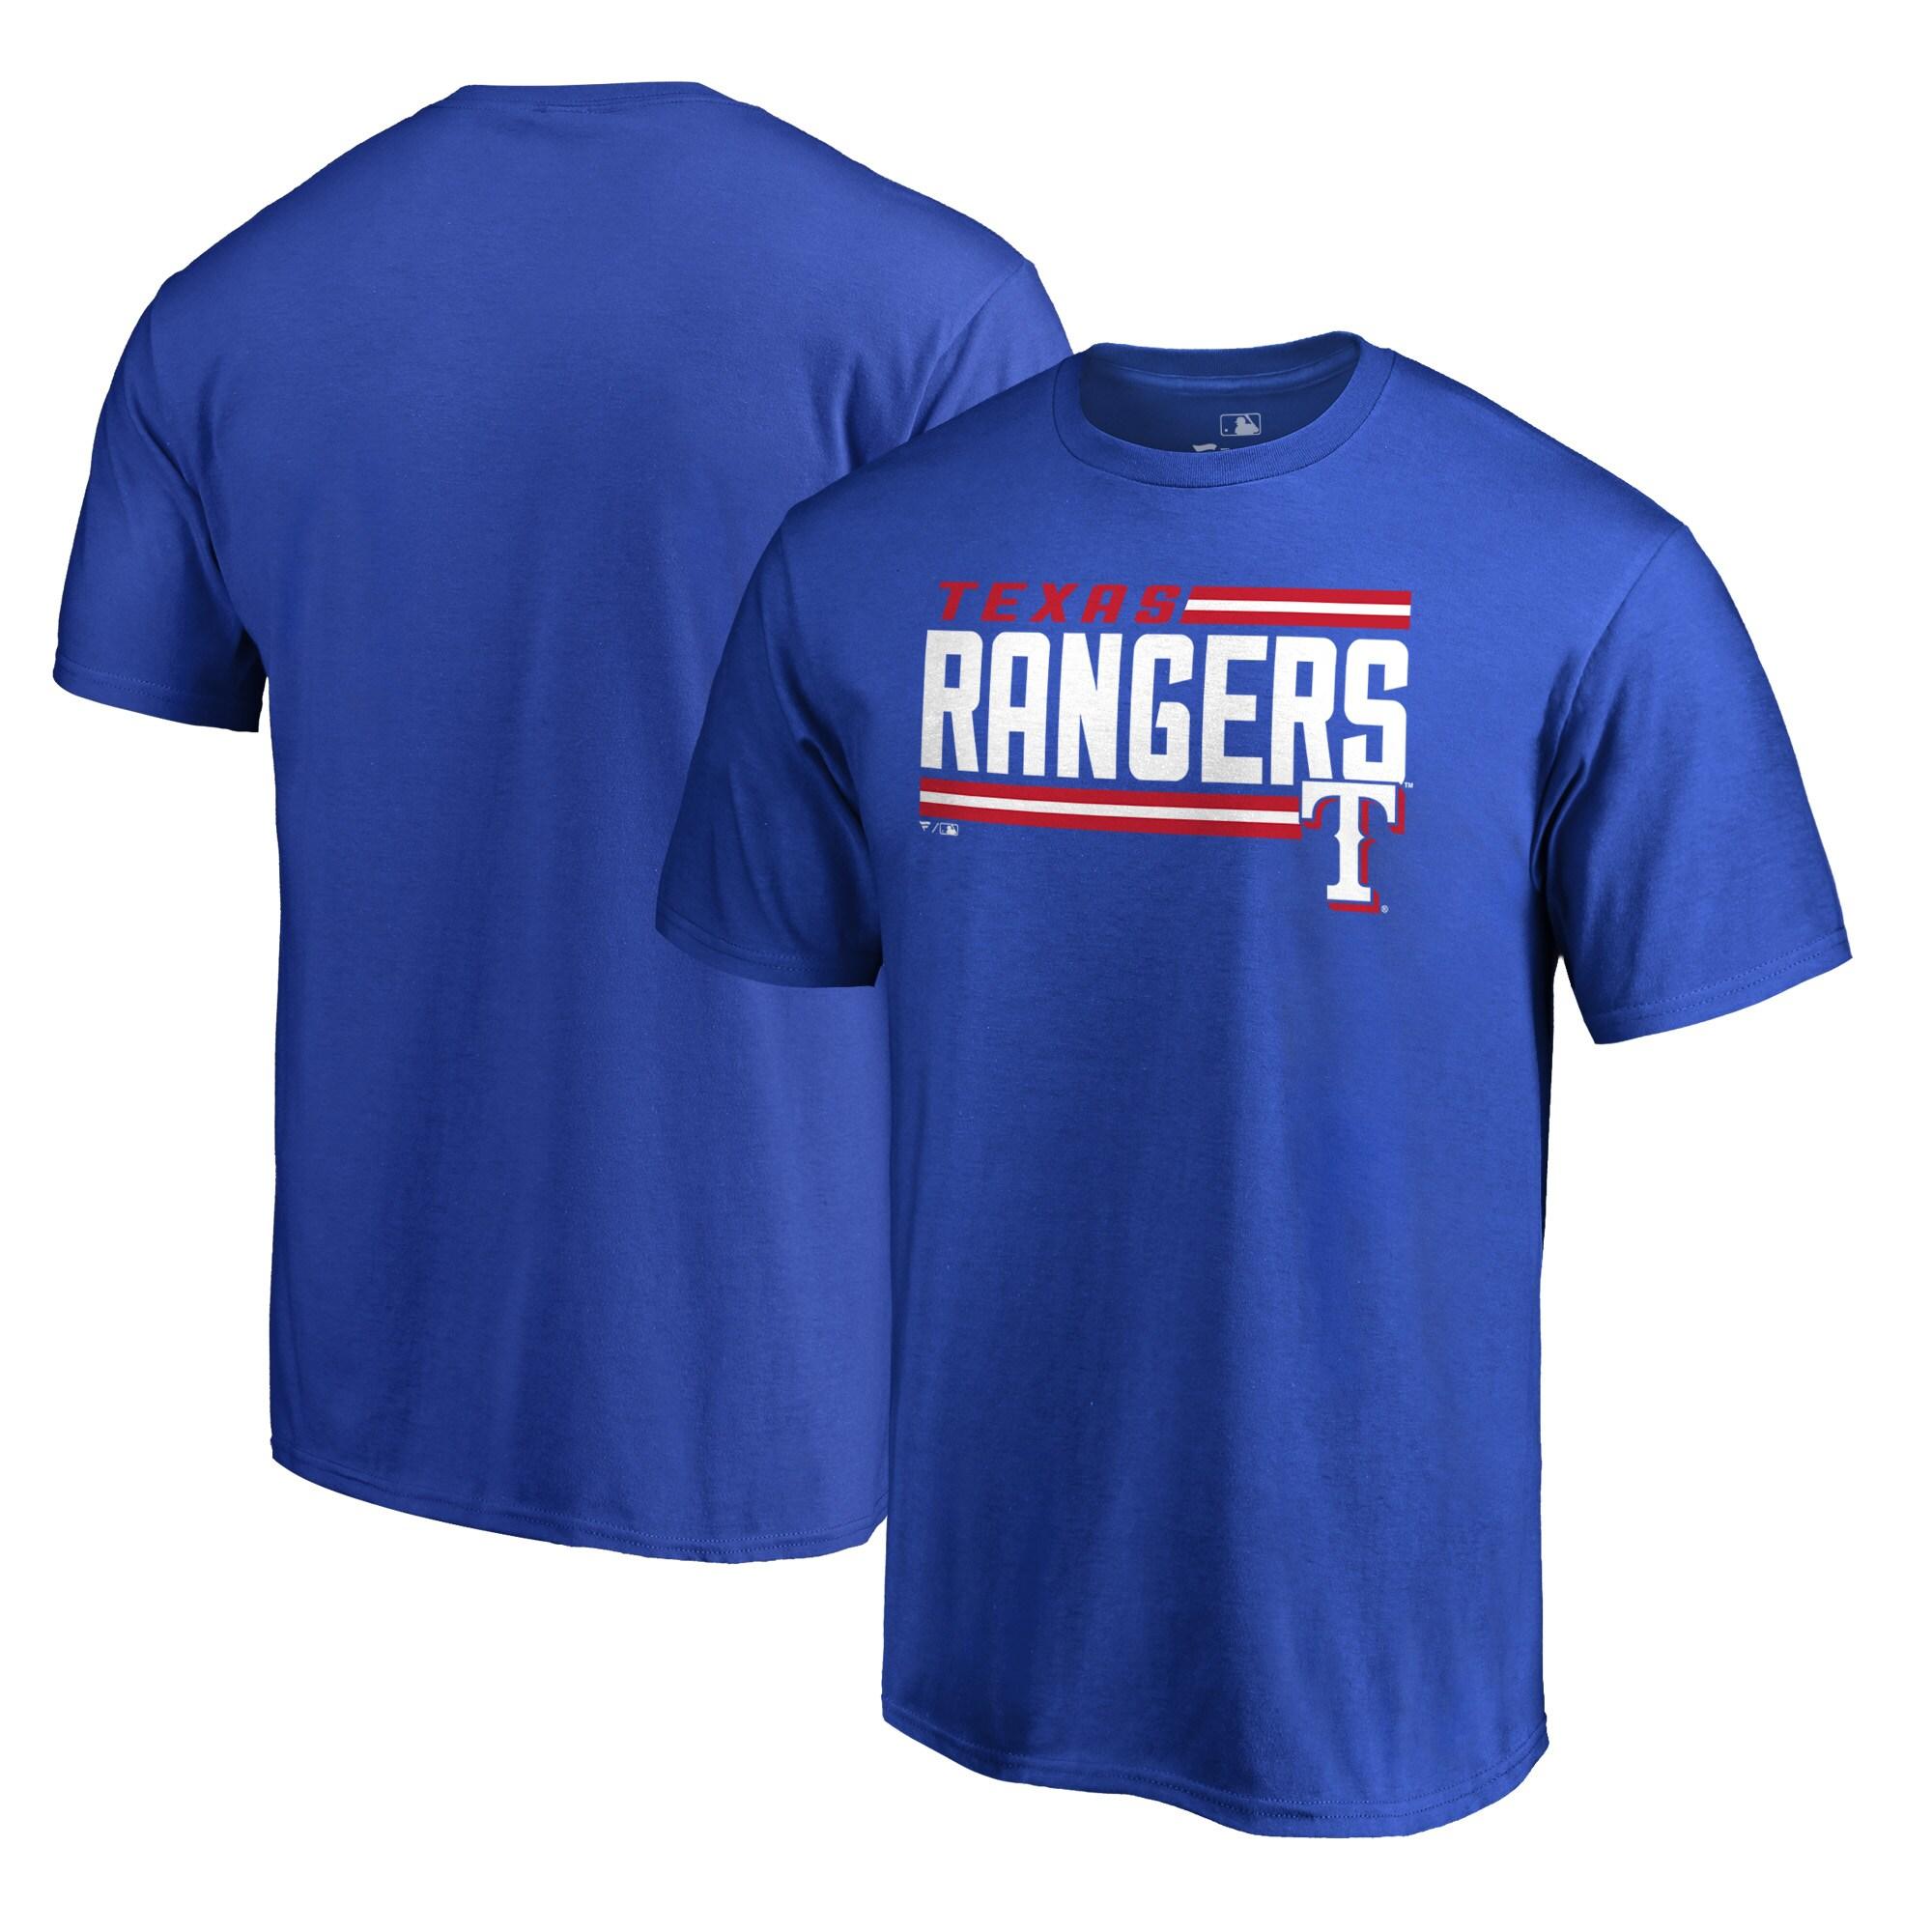 Texas Rangers Fanatics Branded Onside Stripe T-Shirt - Royal